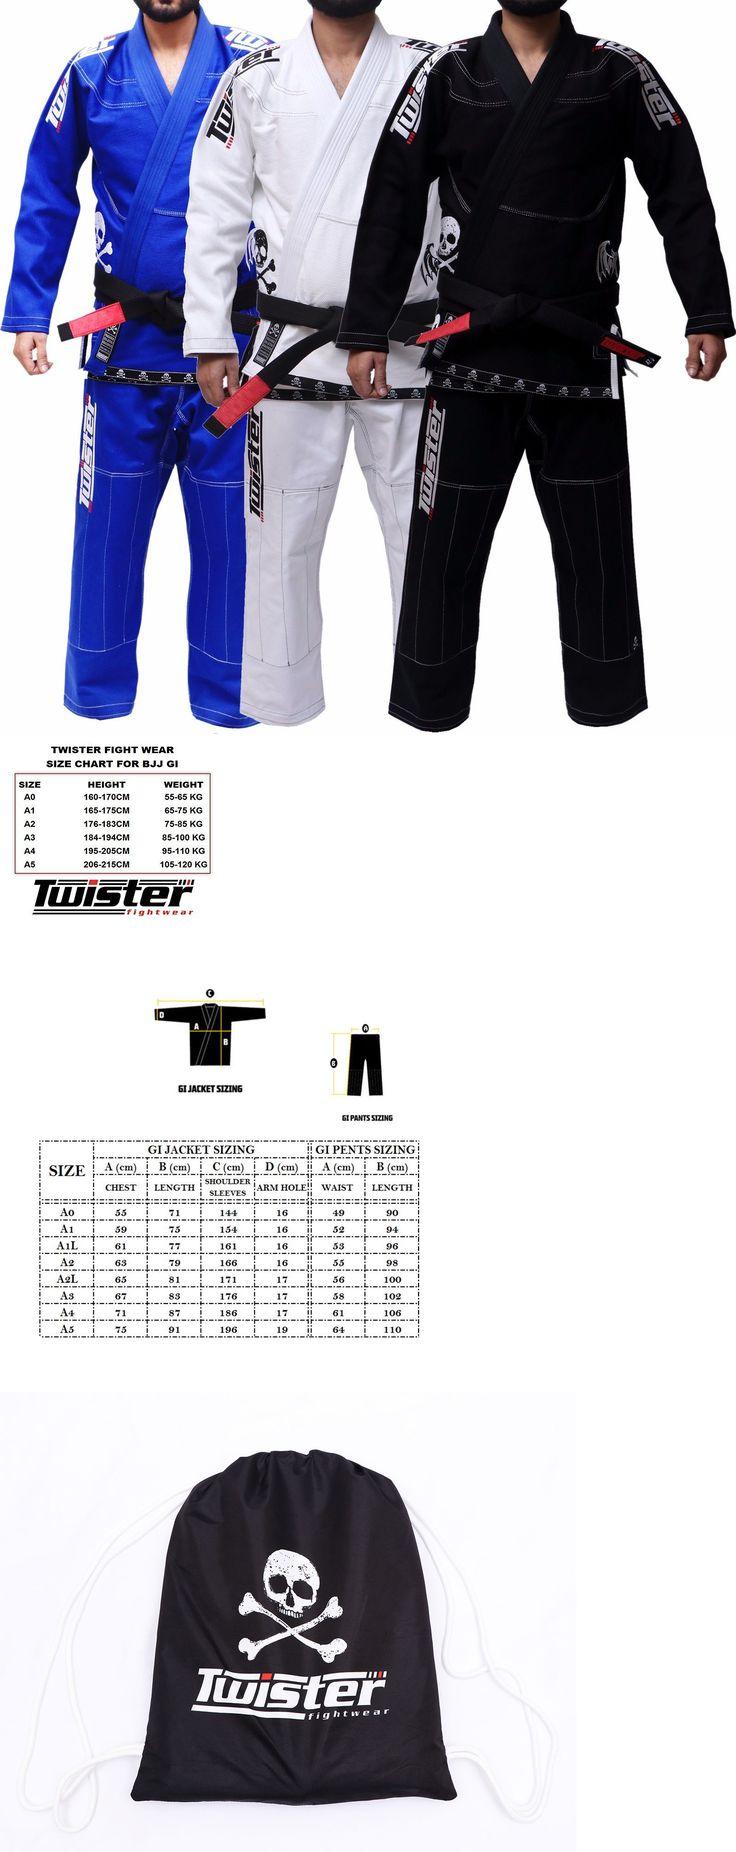 Uniforms and Gis 179774: Twister Fight Brazilian Jiu Jitsu Gi Progress 5.0, Bjj Mma Grappling Uniform -> BUY IT NOW ONLY: $69.99 on eBay!